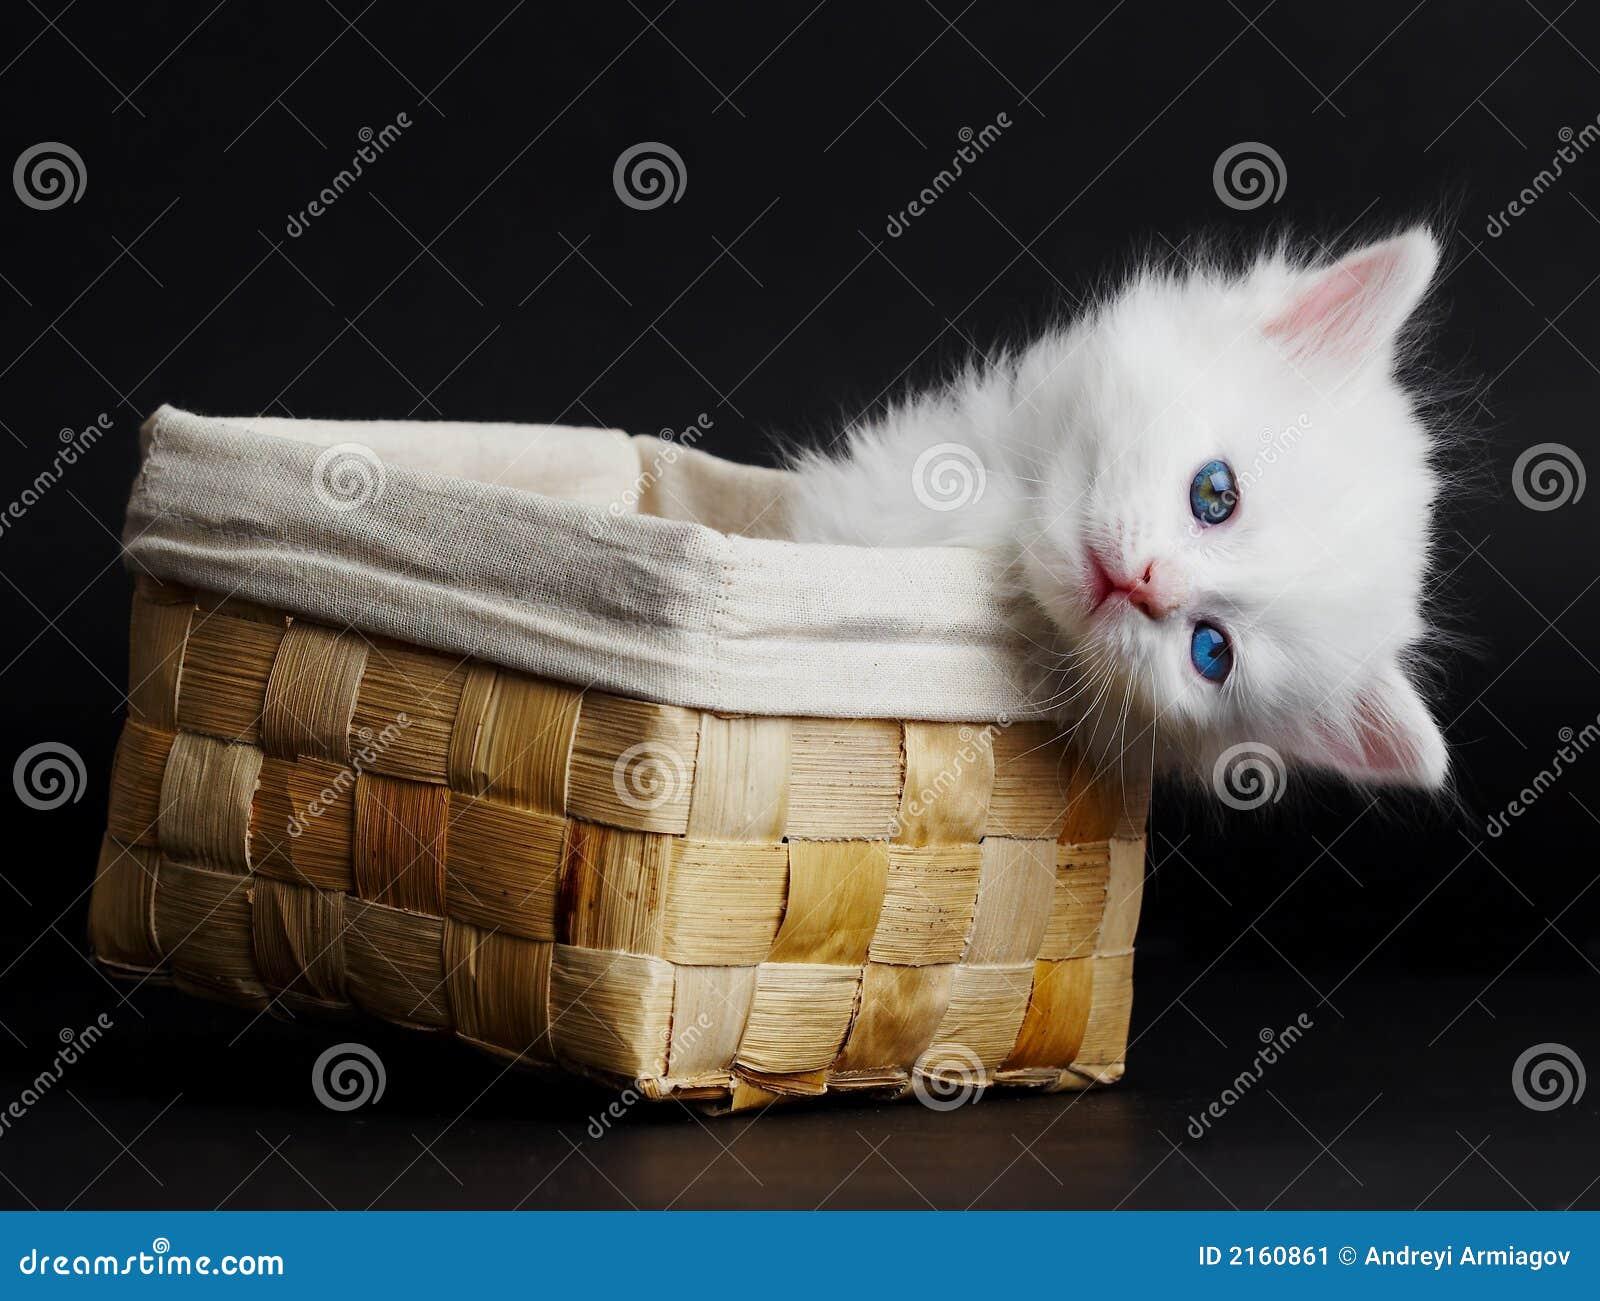 White Kitten In A Basket. Stock Image - Image: 2160861